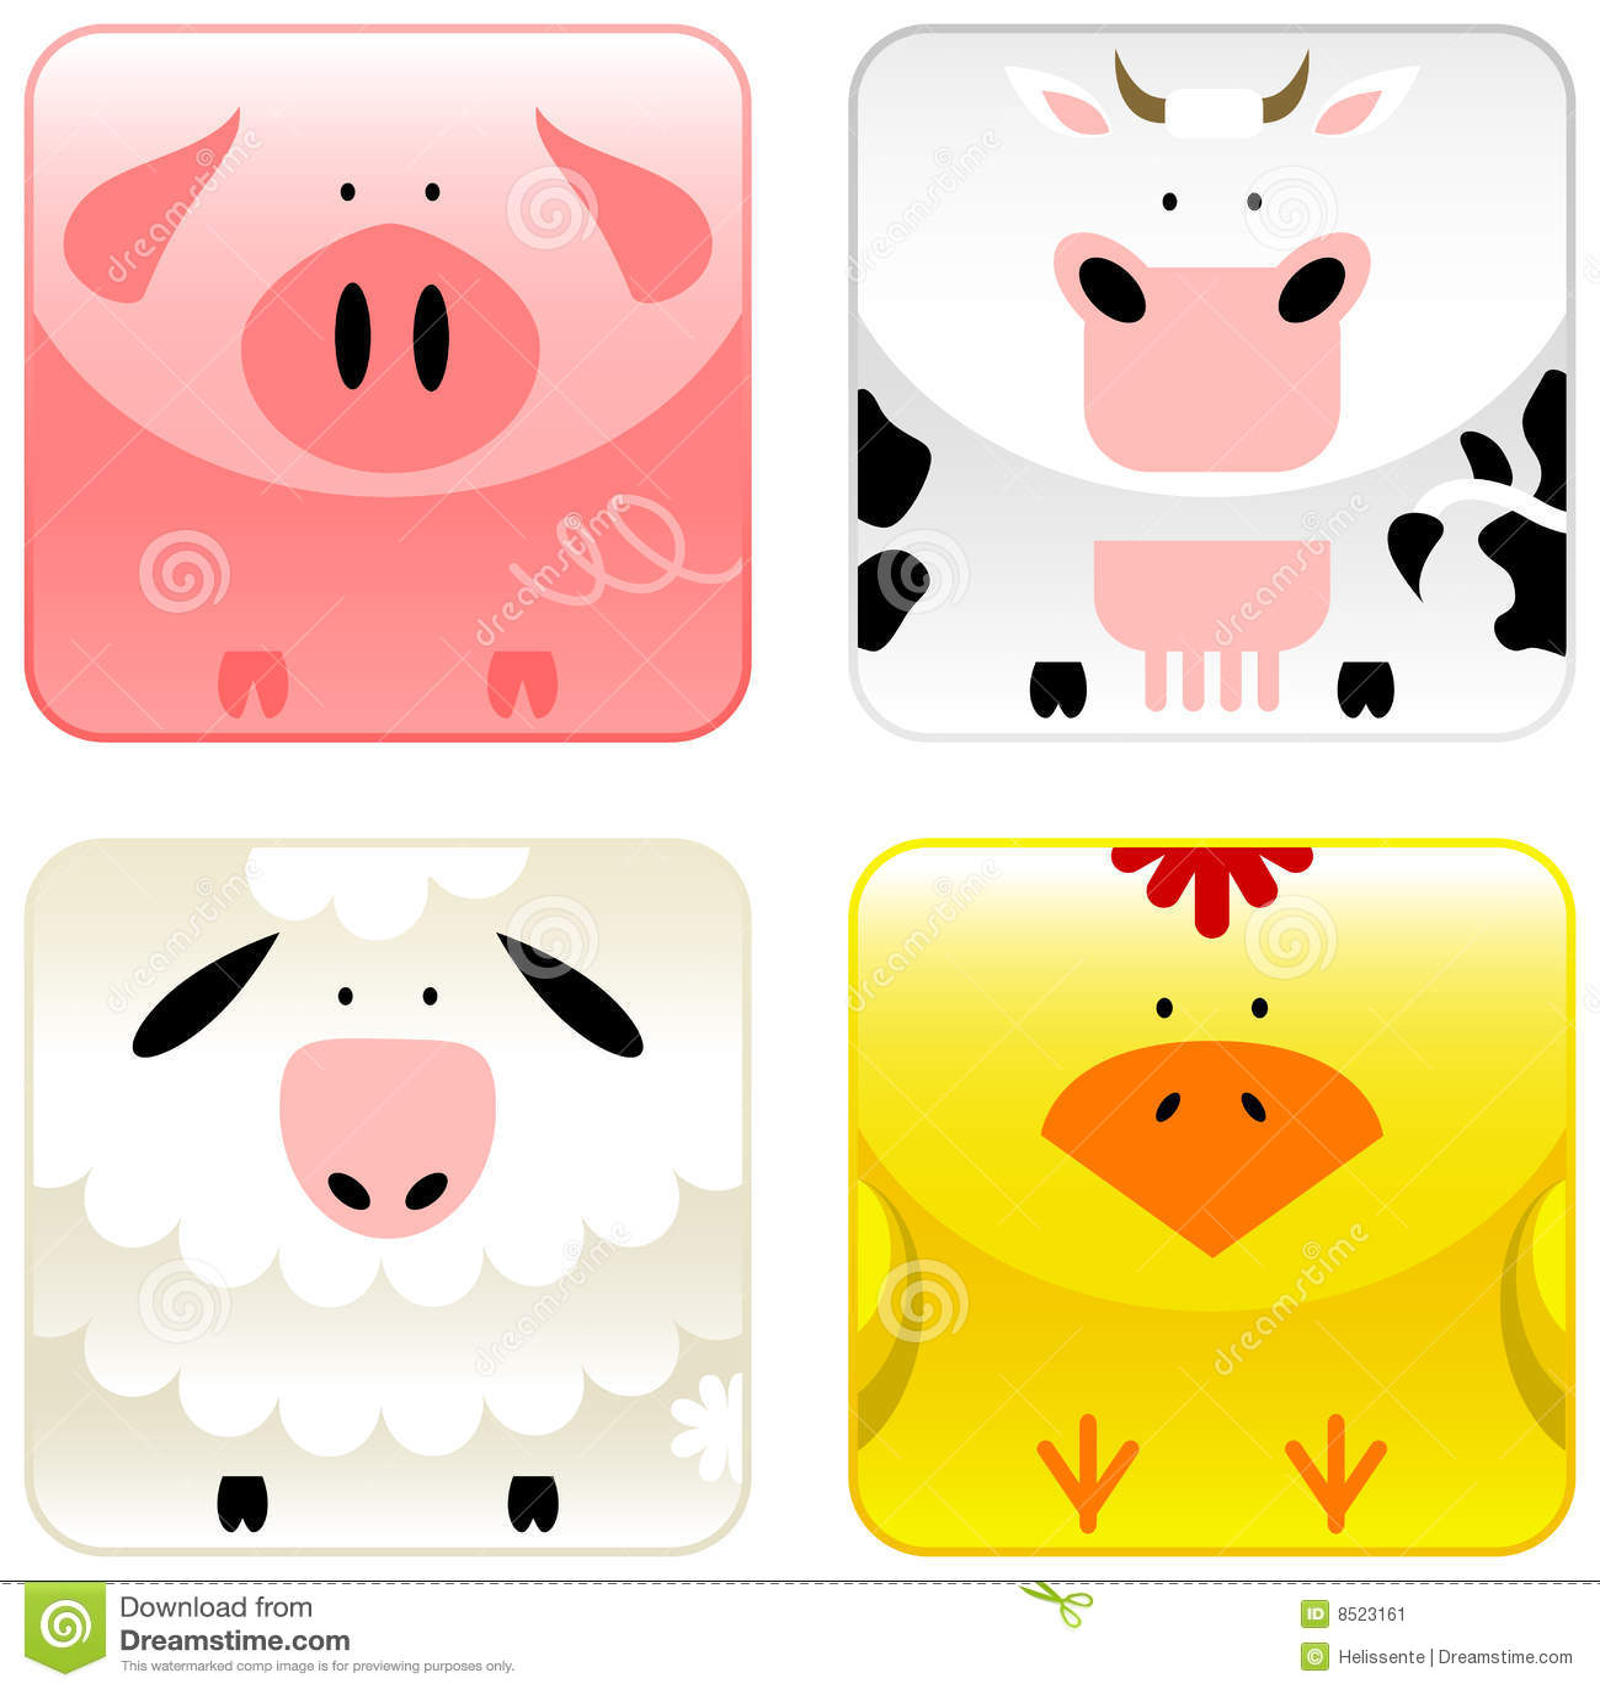 Farm animals - icon set 1